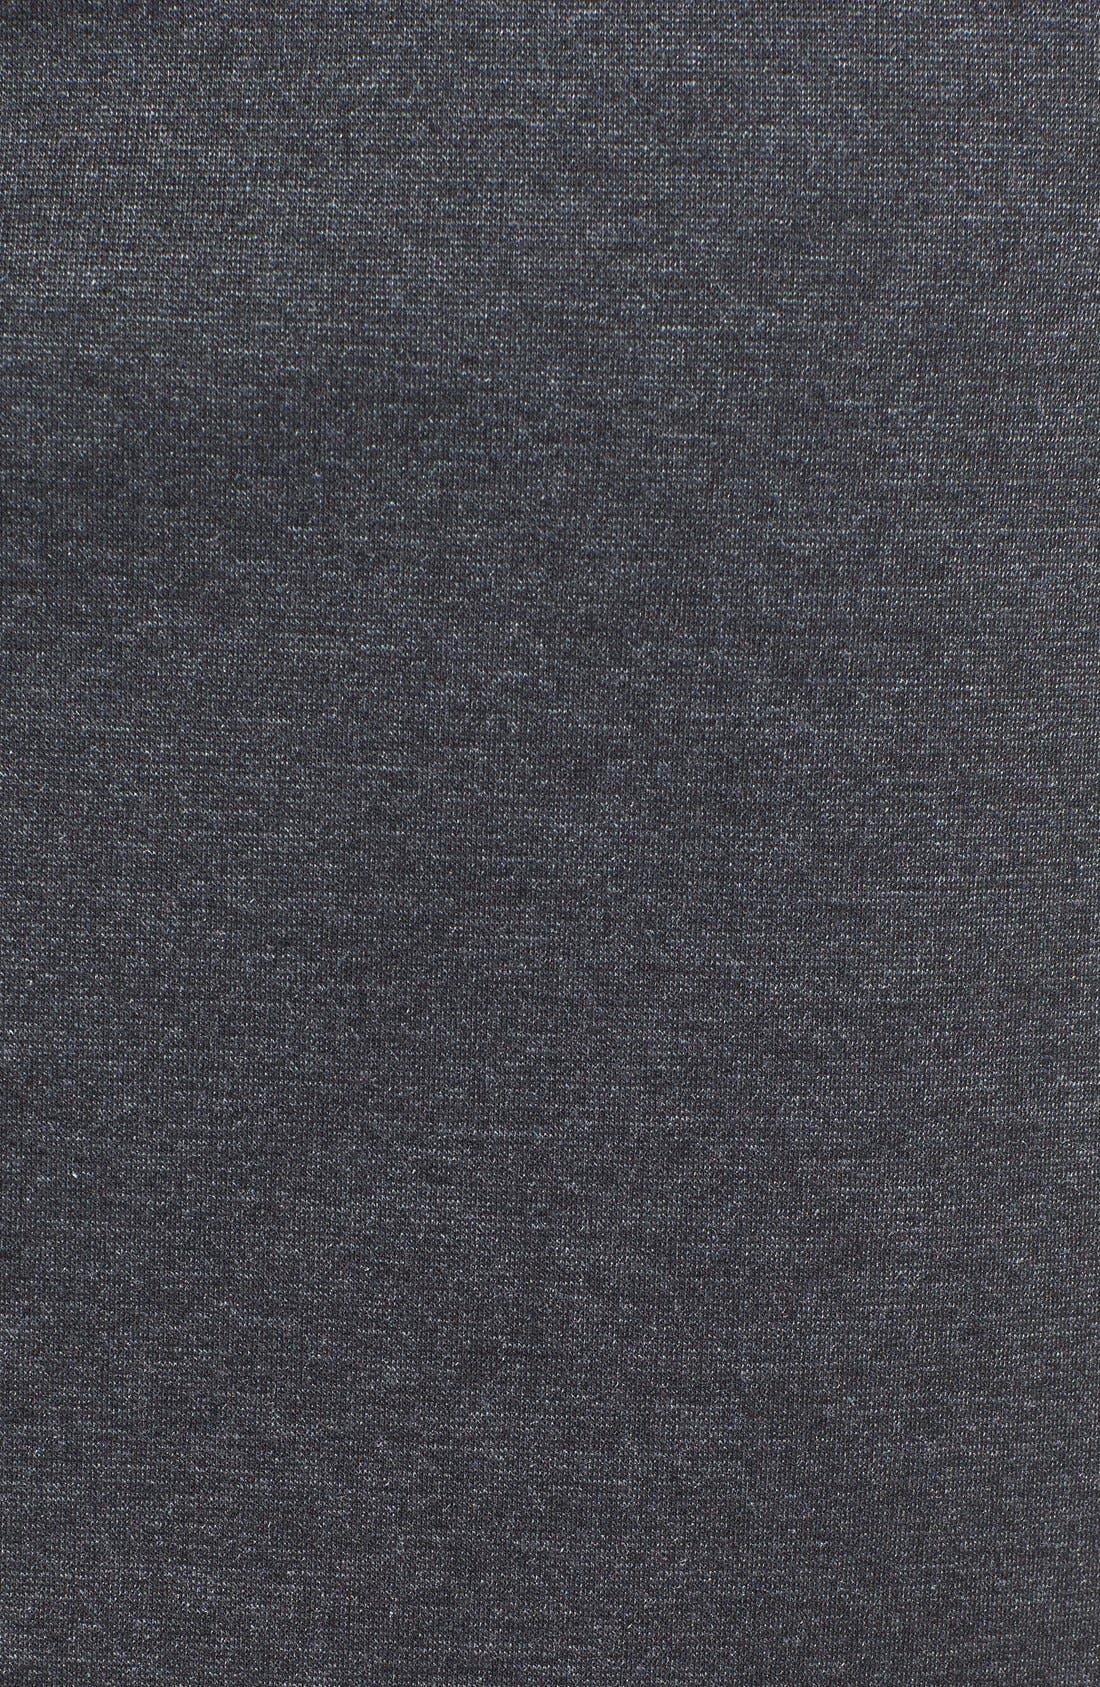 Alternate Image 3  - Vince Camuto Lace Panel Pencil Skirt (Plus Size)